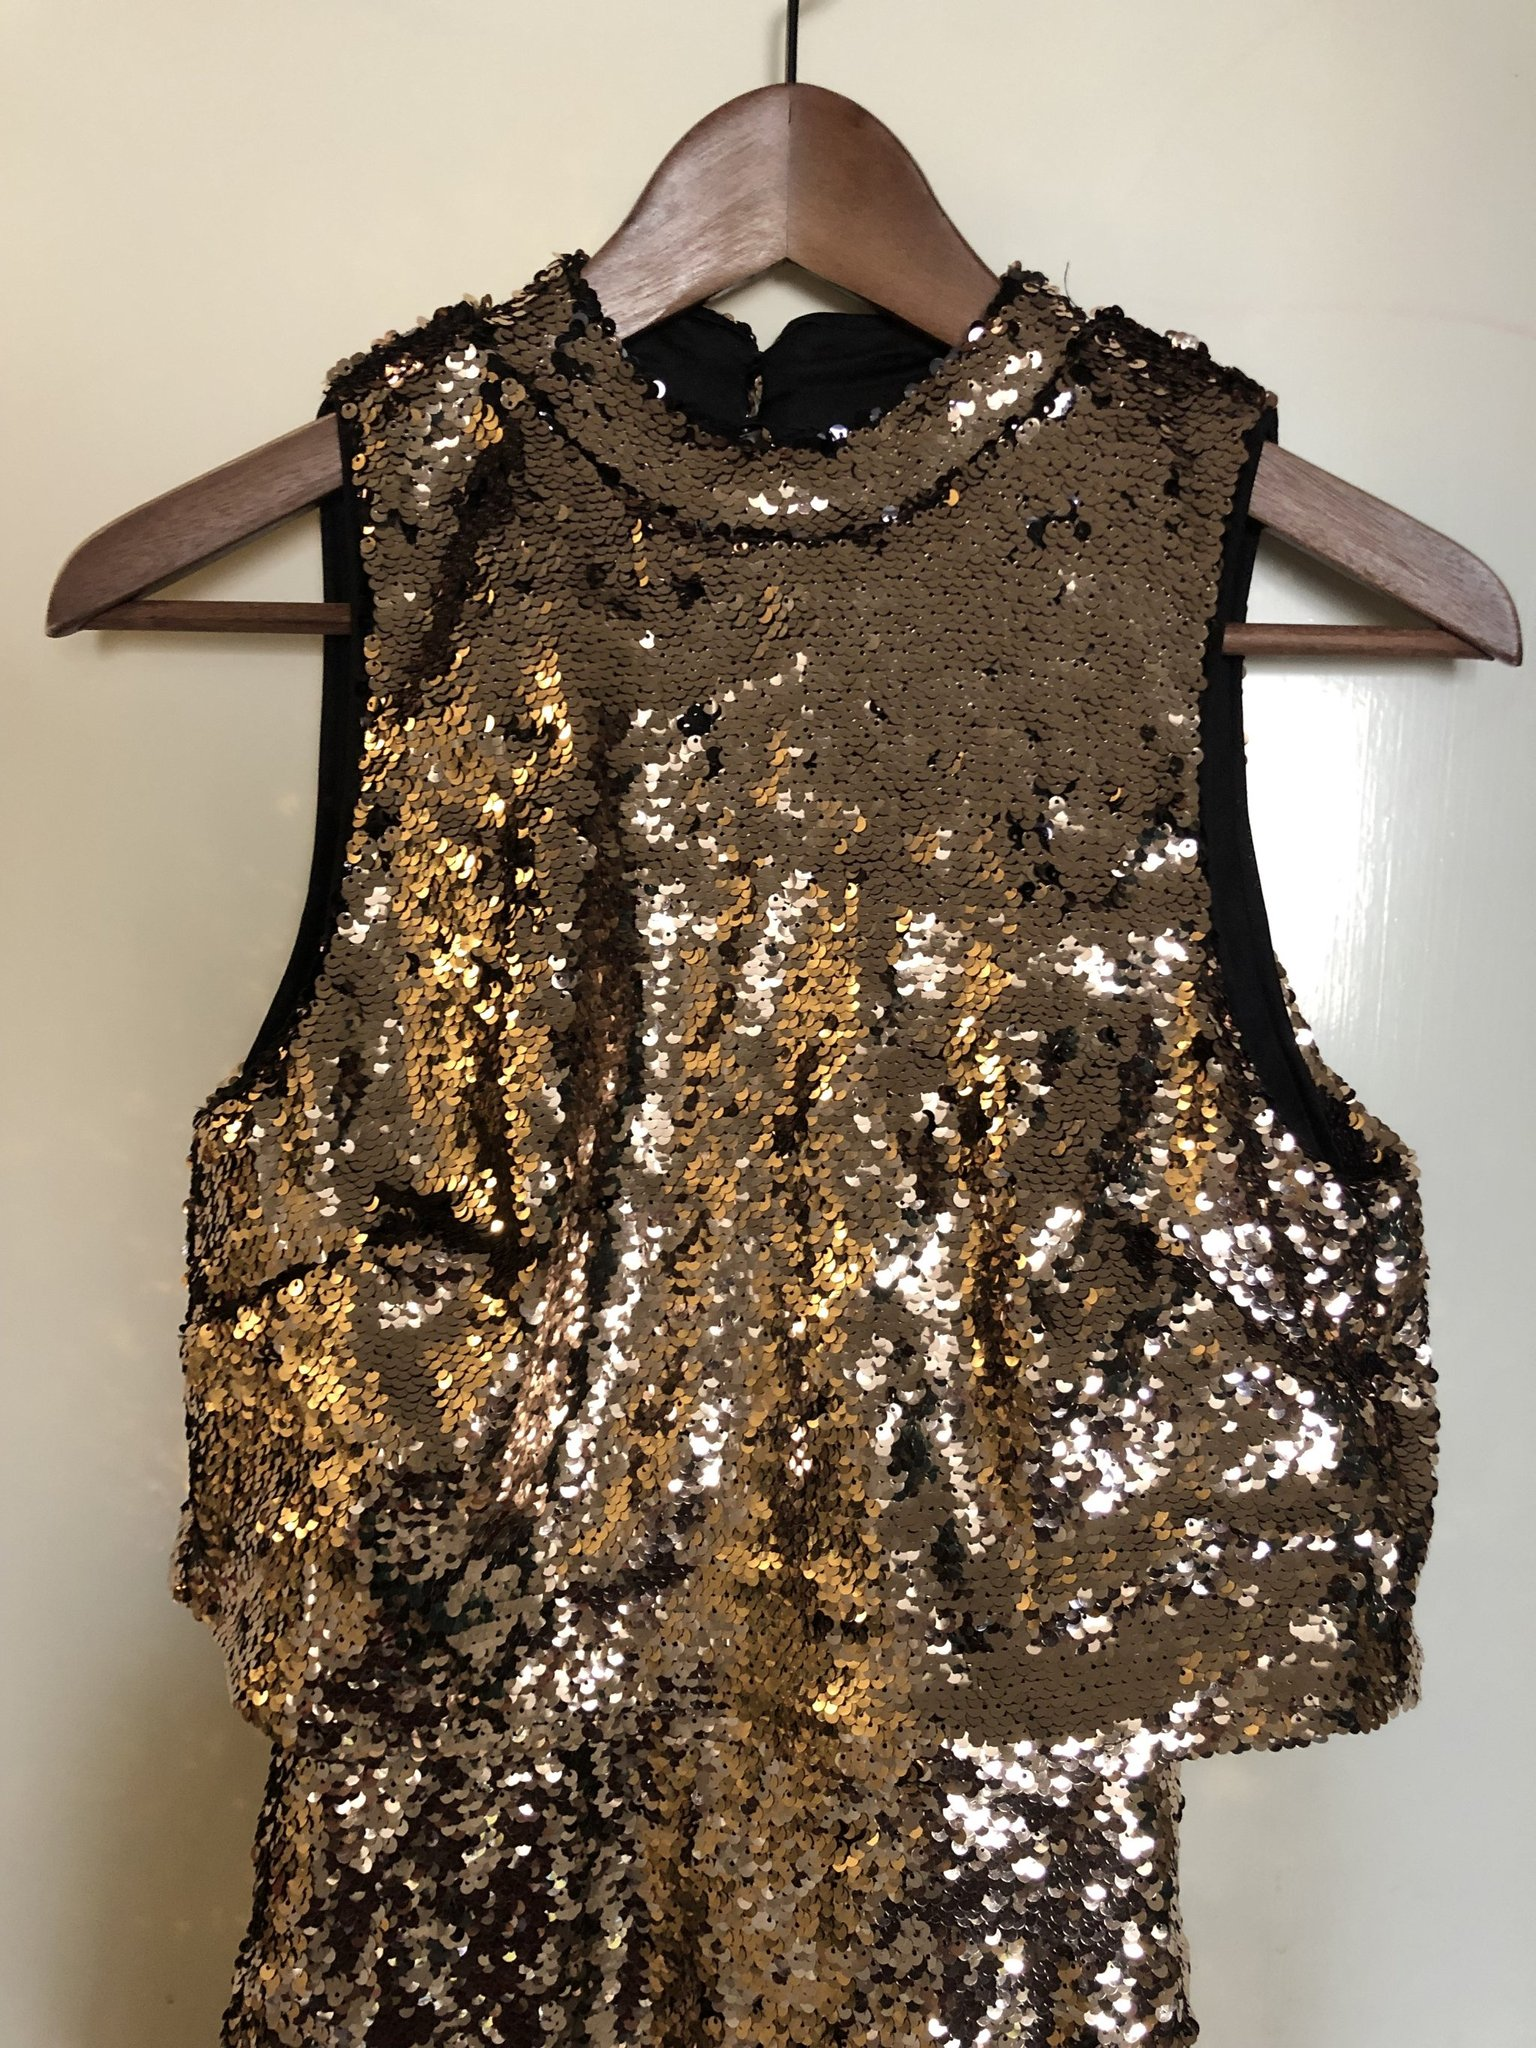 1000c9c214a7 HM, paljettklänning guld, stl 36, bar rygg, OAN.. (347227889) ᐈ Köp ...